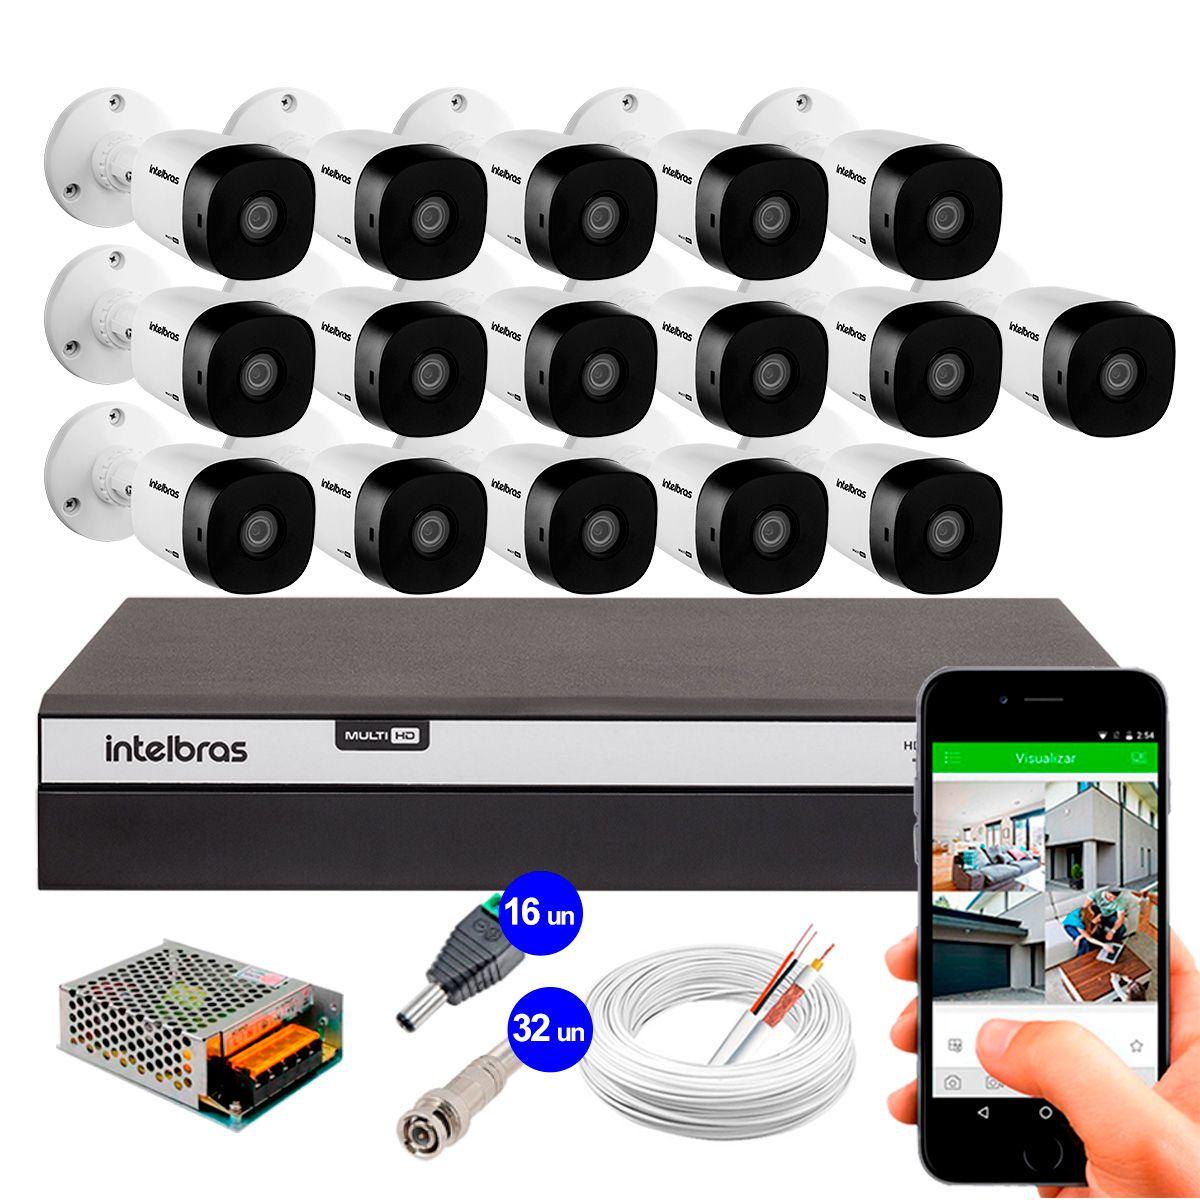 Kit 16 Câmeras de Segurança Full HD 1080p Intelbras VHD 1220B IR + DVR Intelbras Full HD 16 Ch + Acessórios  - Tudo Forte